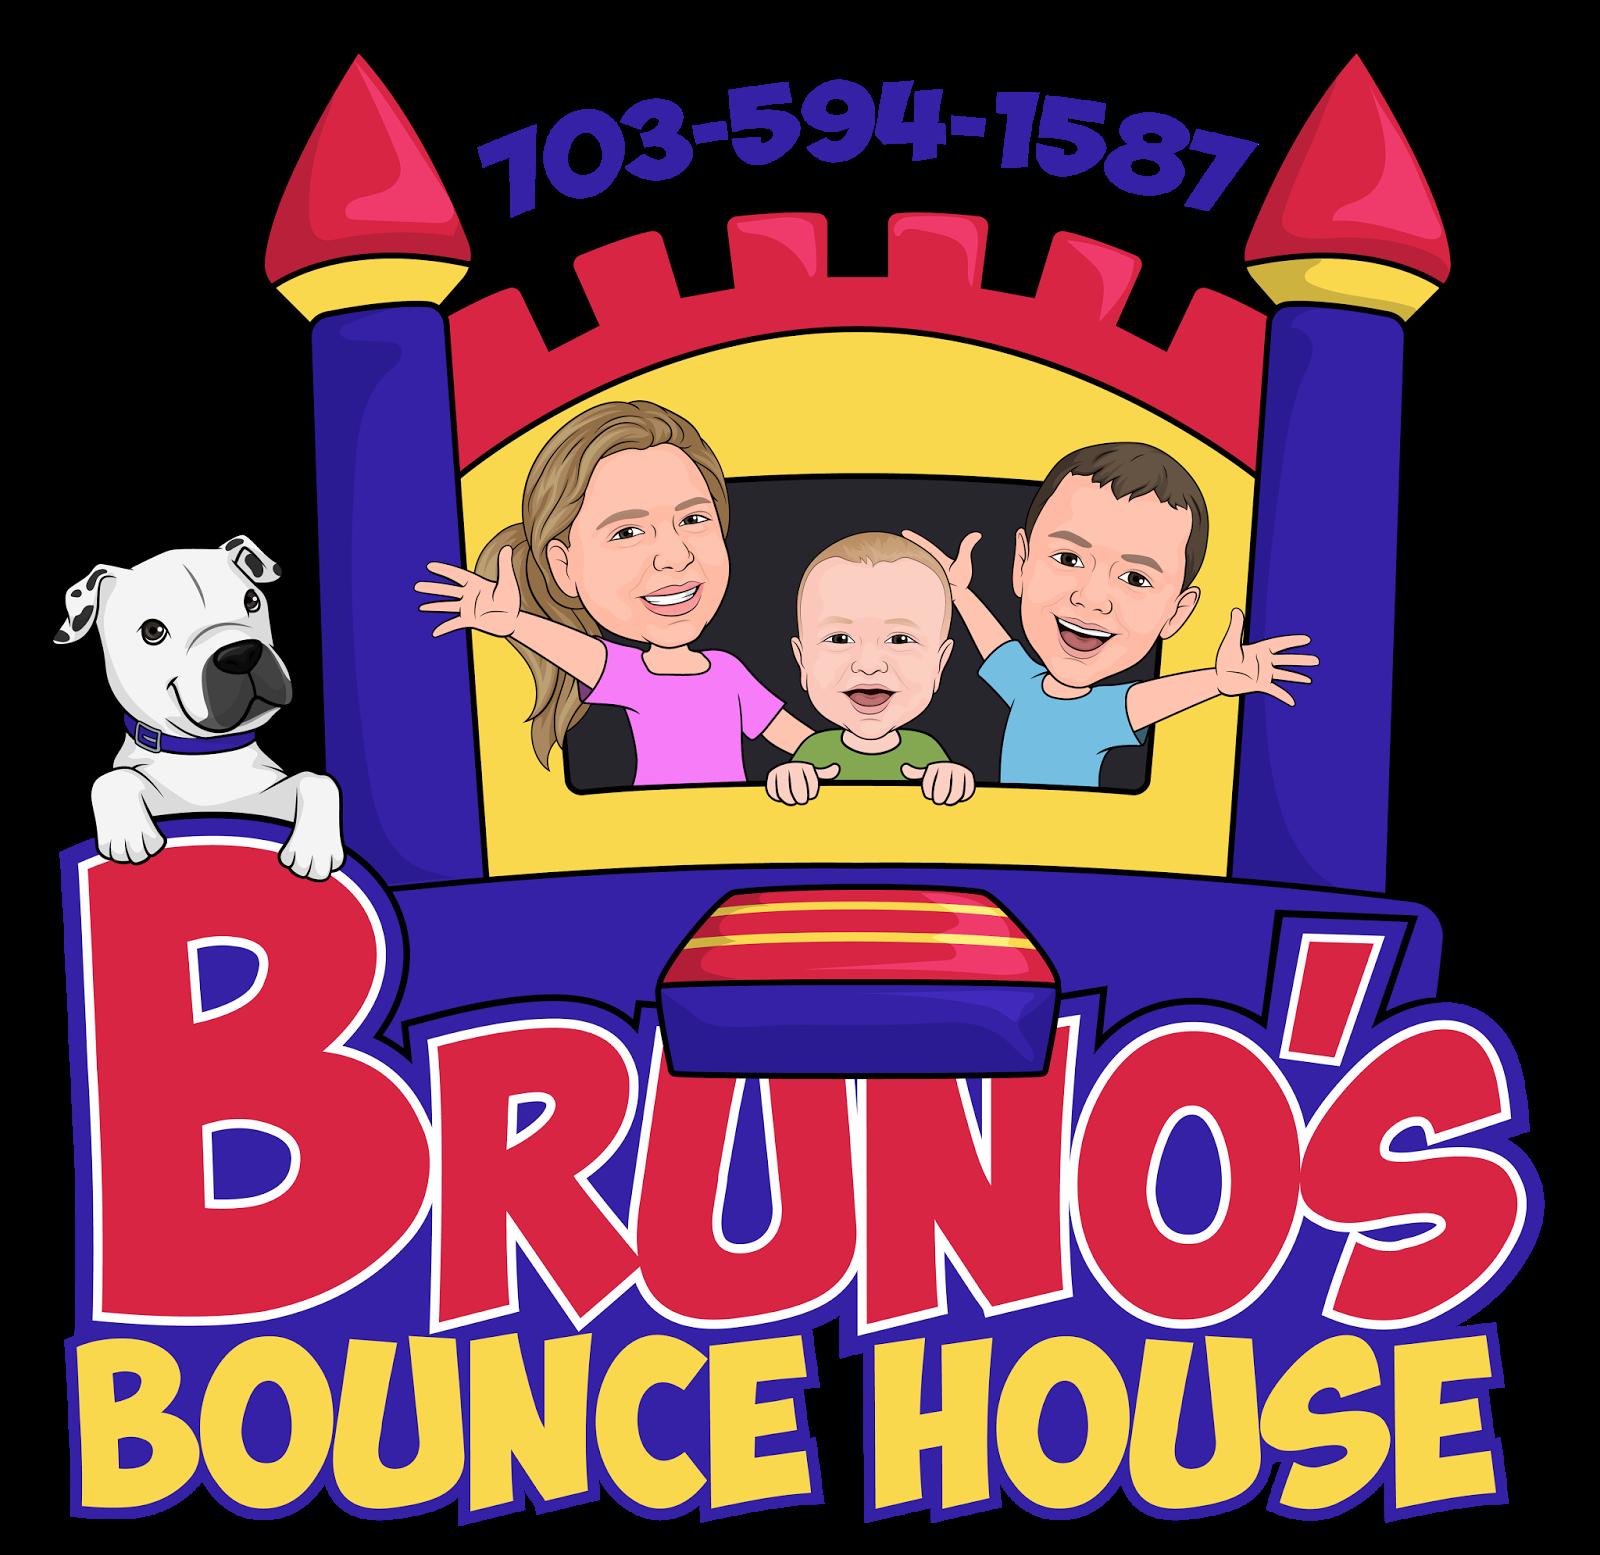 Bounce House Rental   703-594-1587